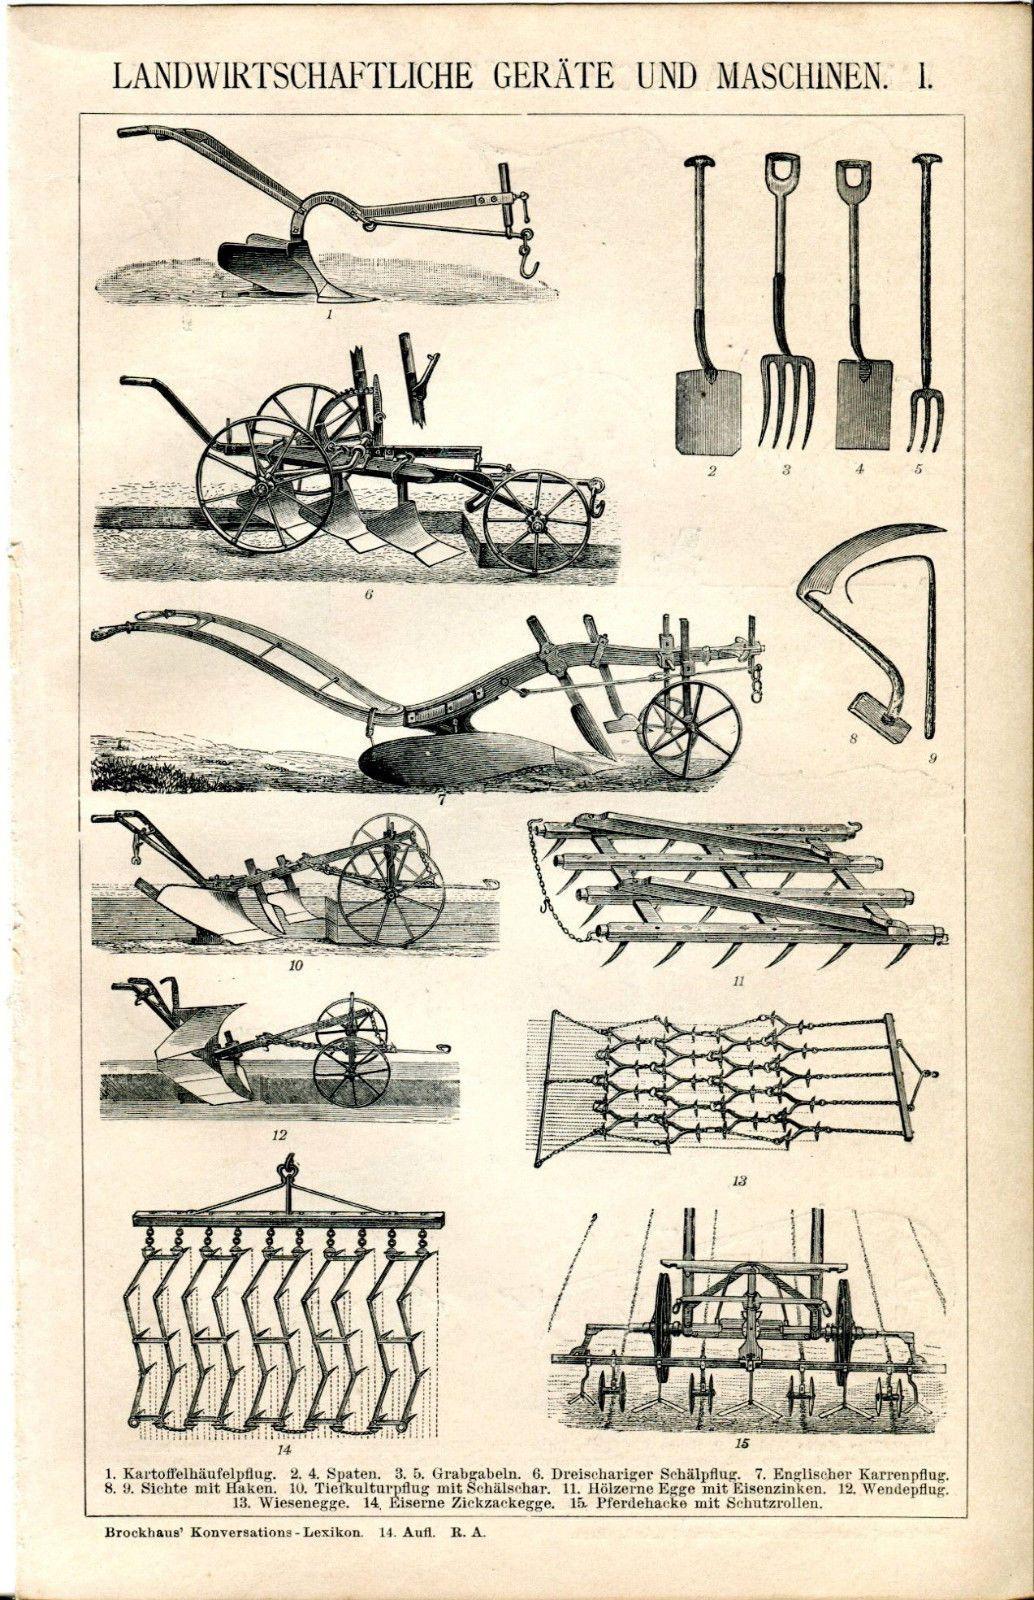 Ca 1890 Agricultural Equipment And Machinery I Ii Antique Print Ebay Old Farm Equipment Vintage Tractors Antique Tractors